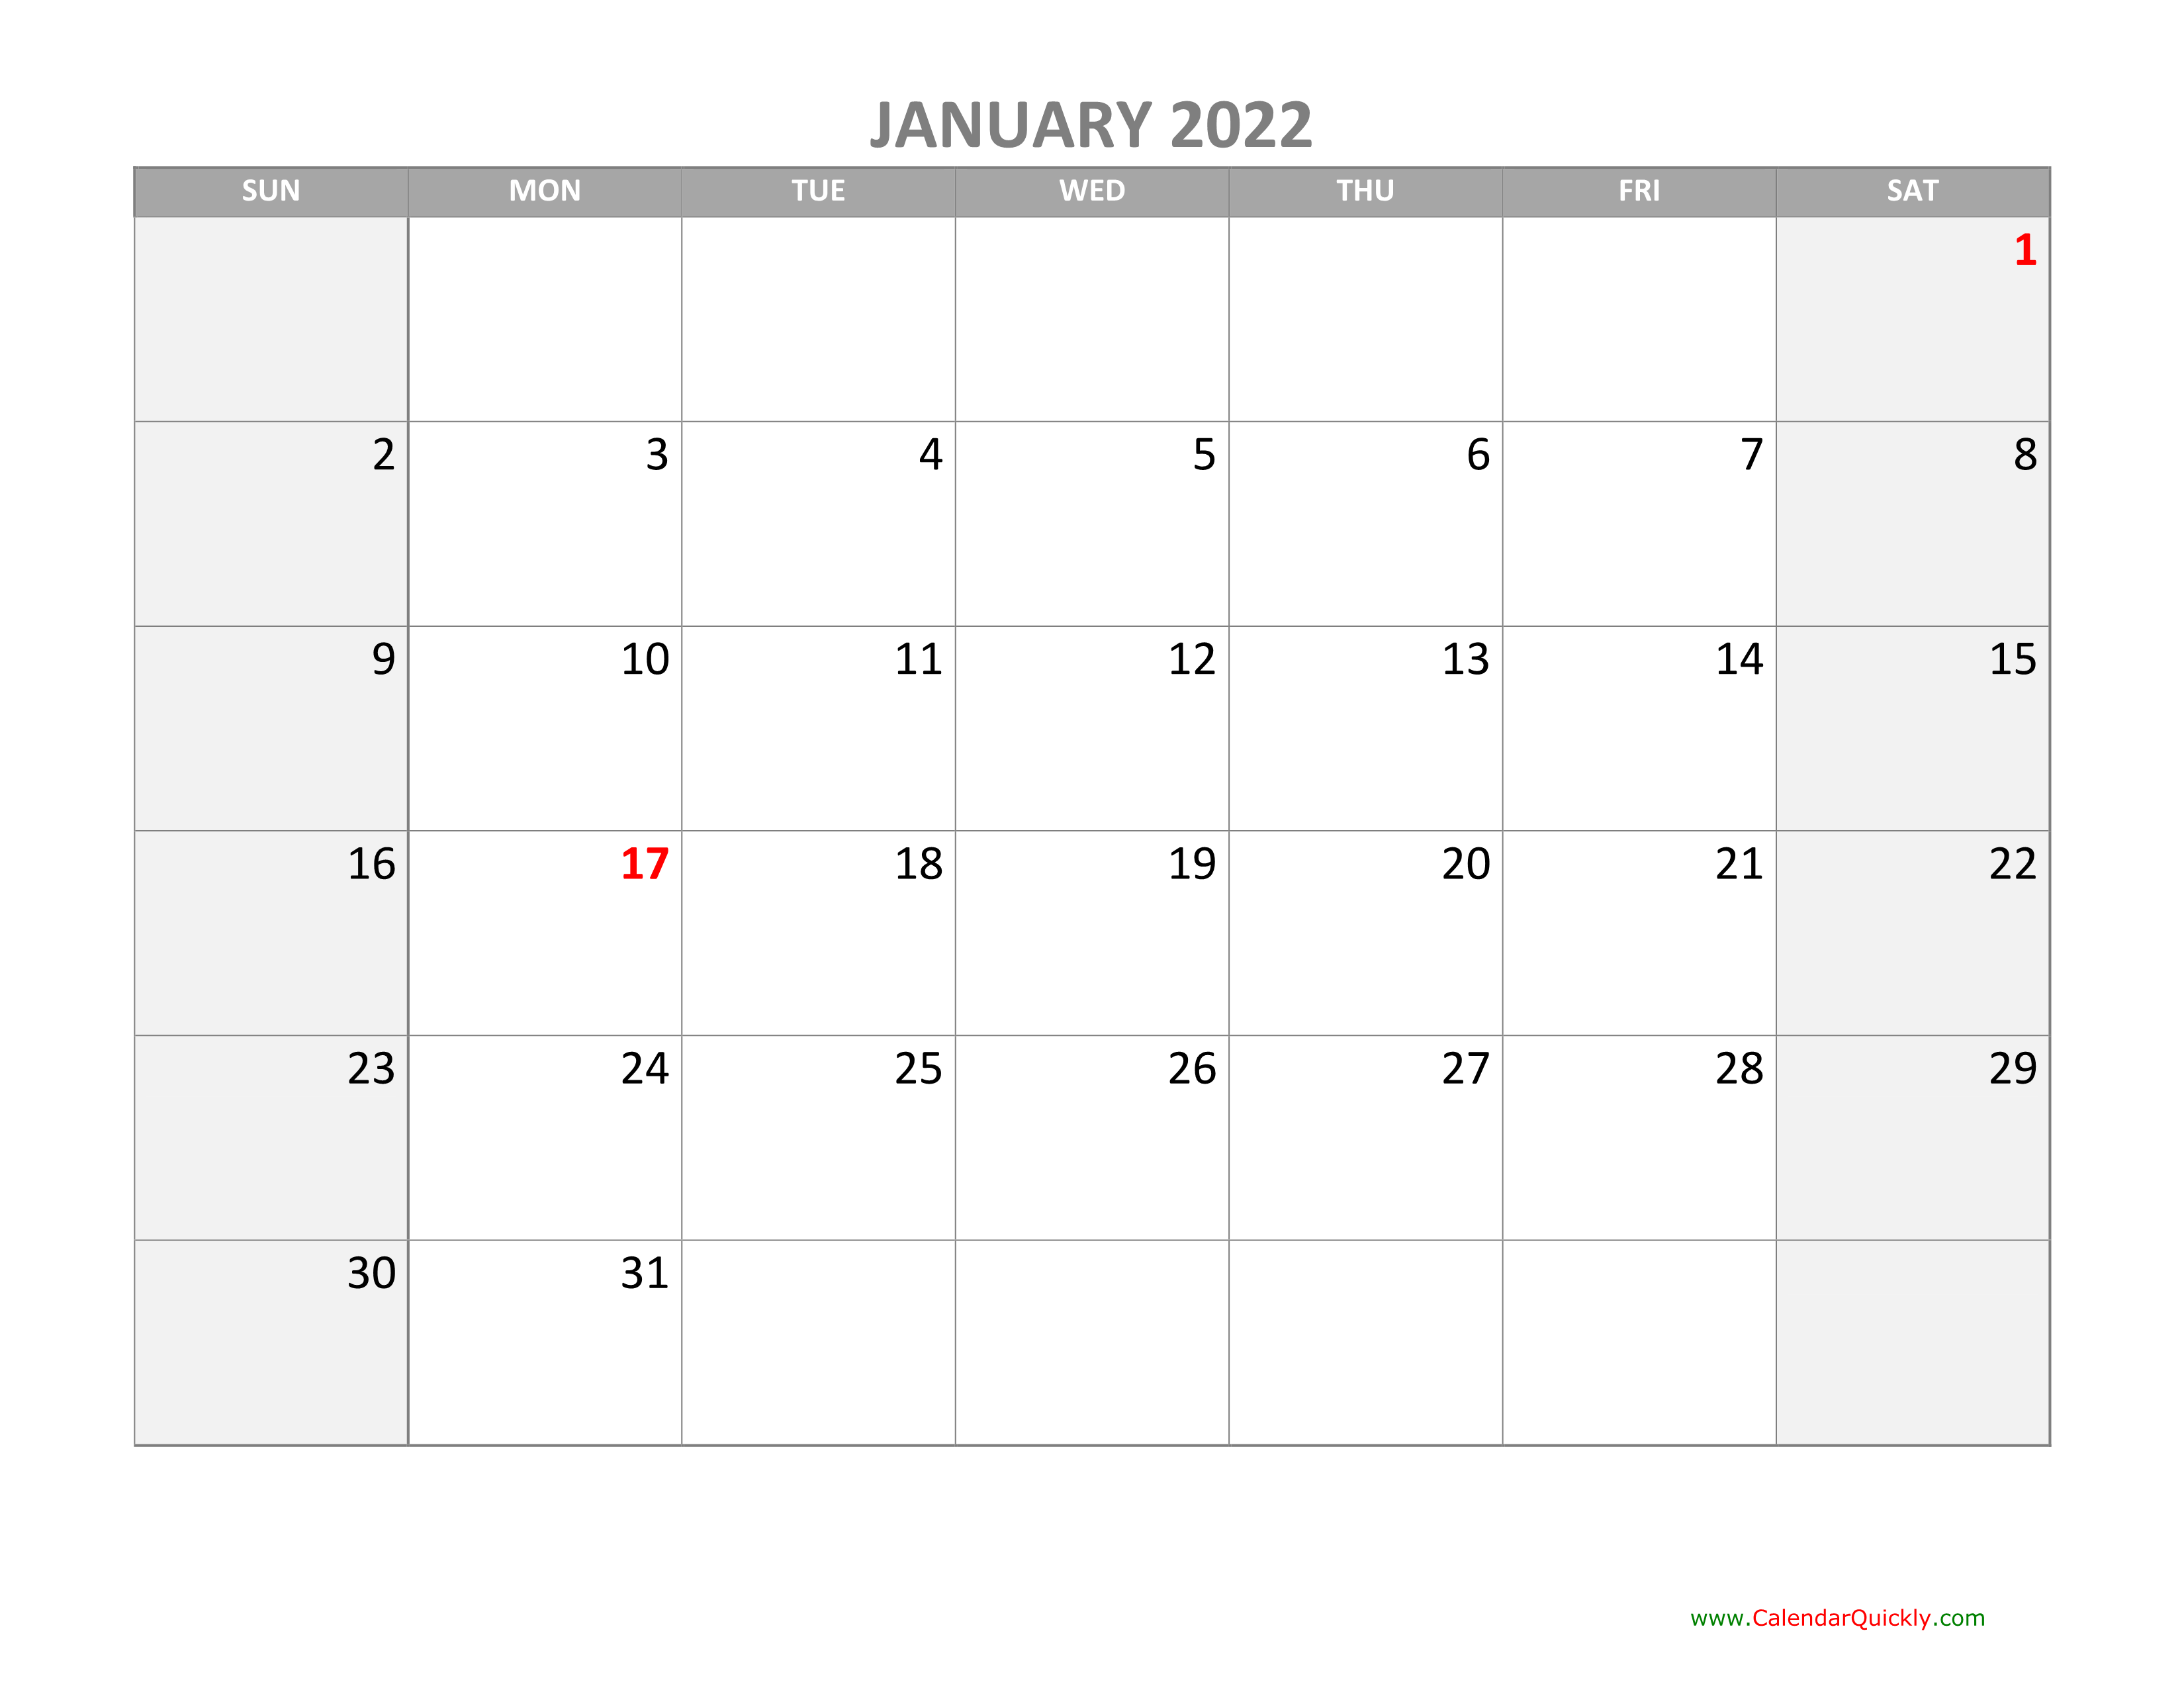 Monthly Calendar 2022 With Holidays   Calendar Quickly With Regard To 2022 January Calendar With Holidays